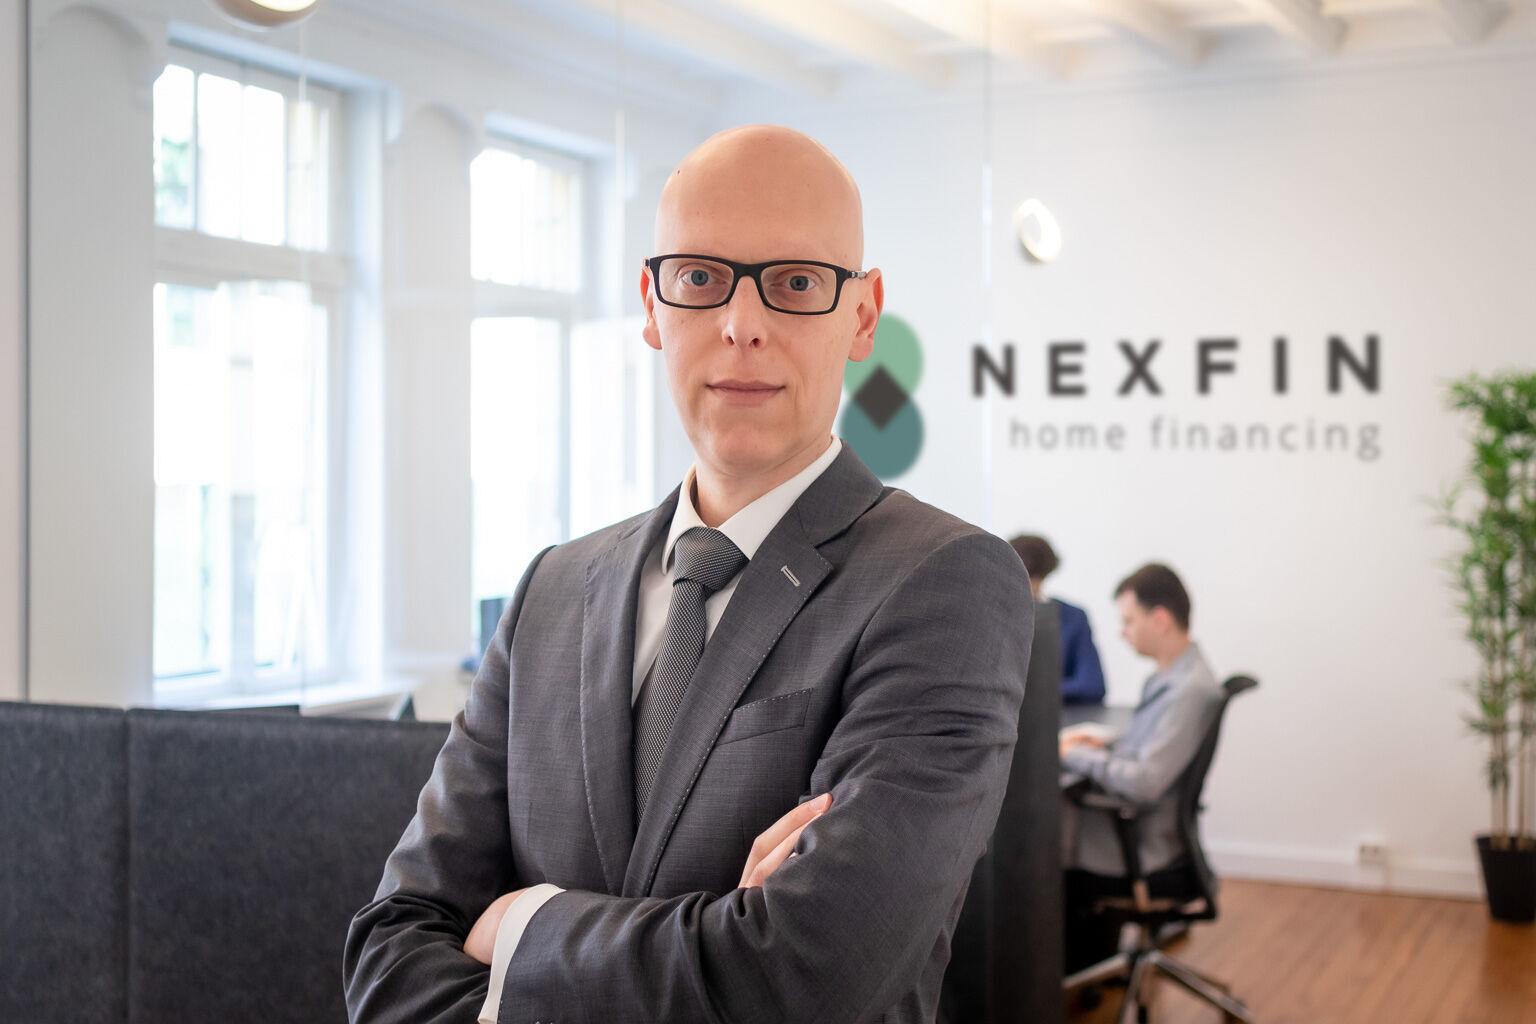 Nexfin